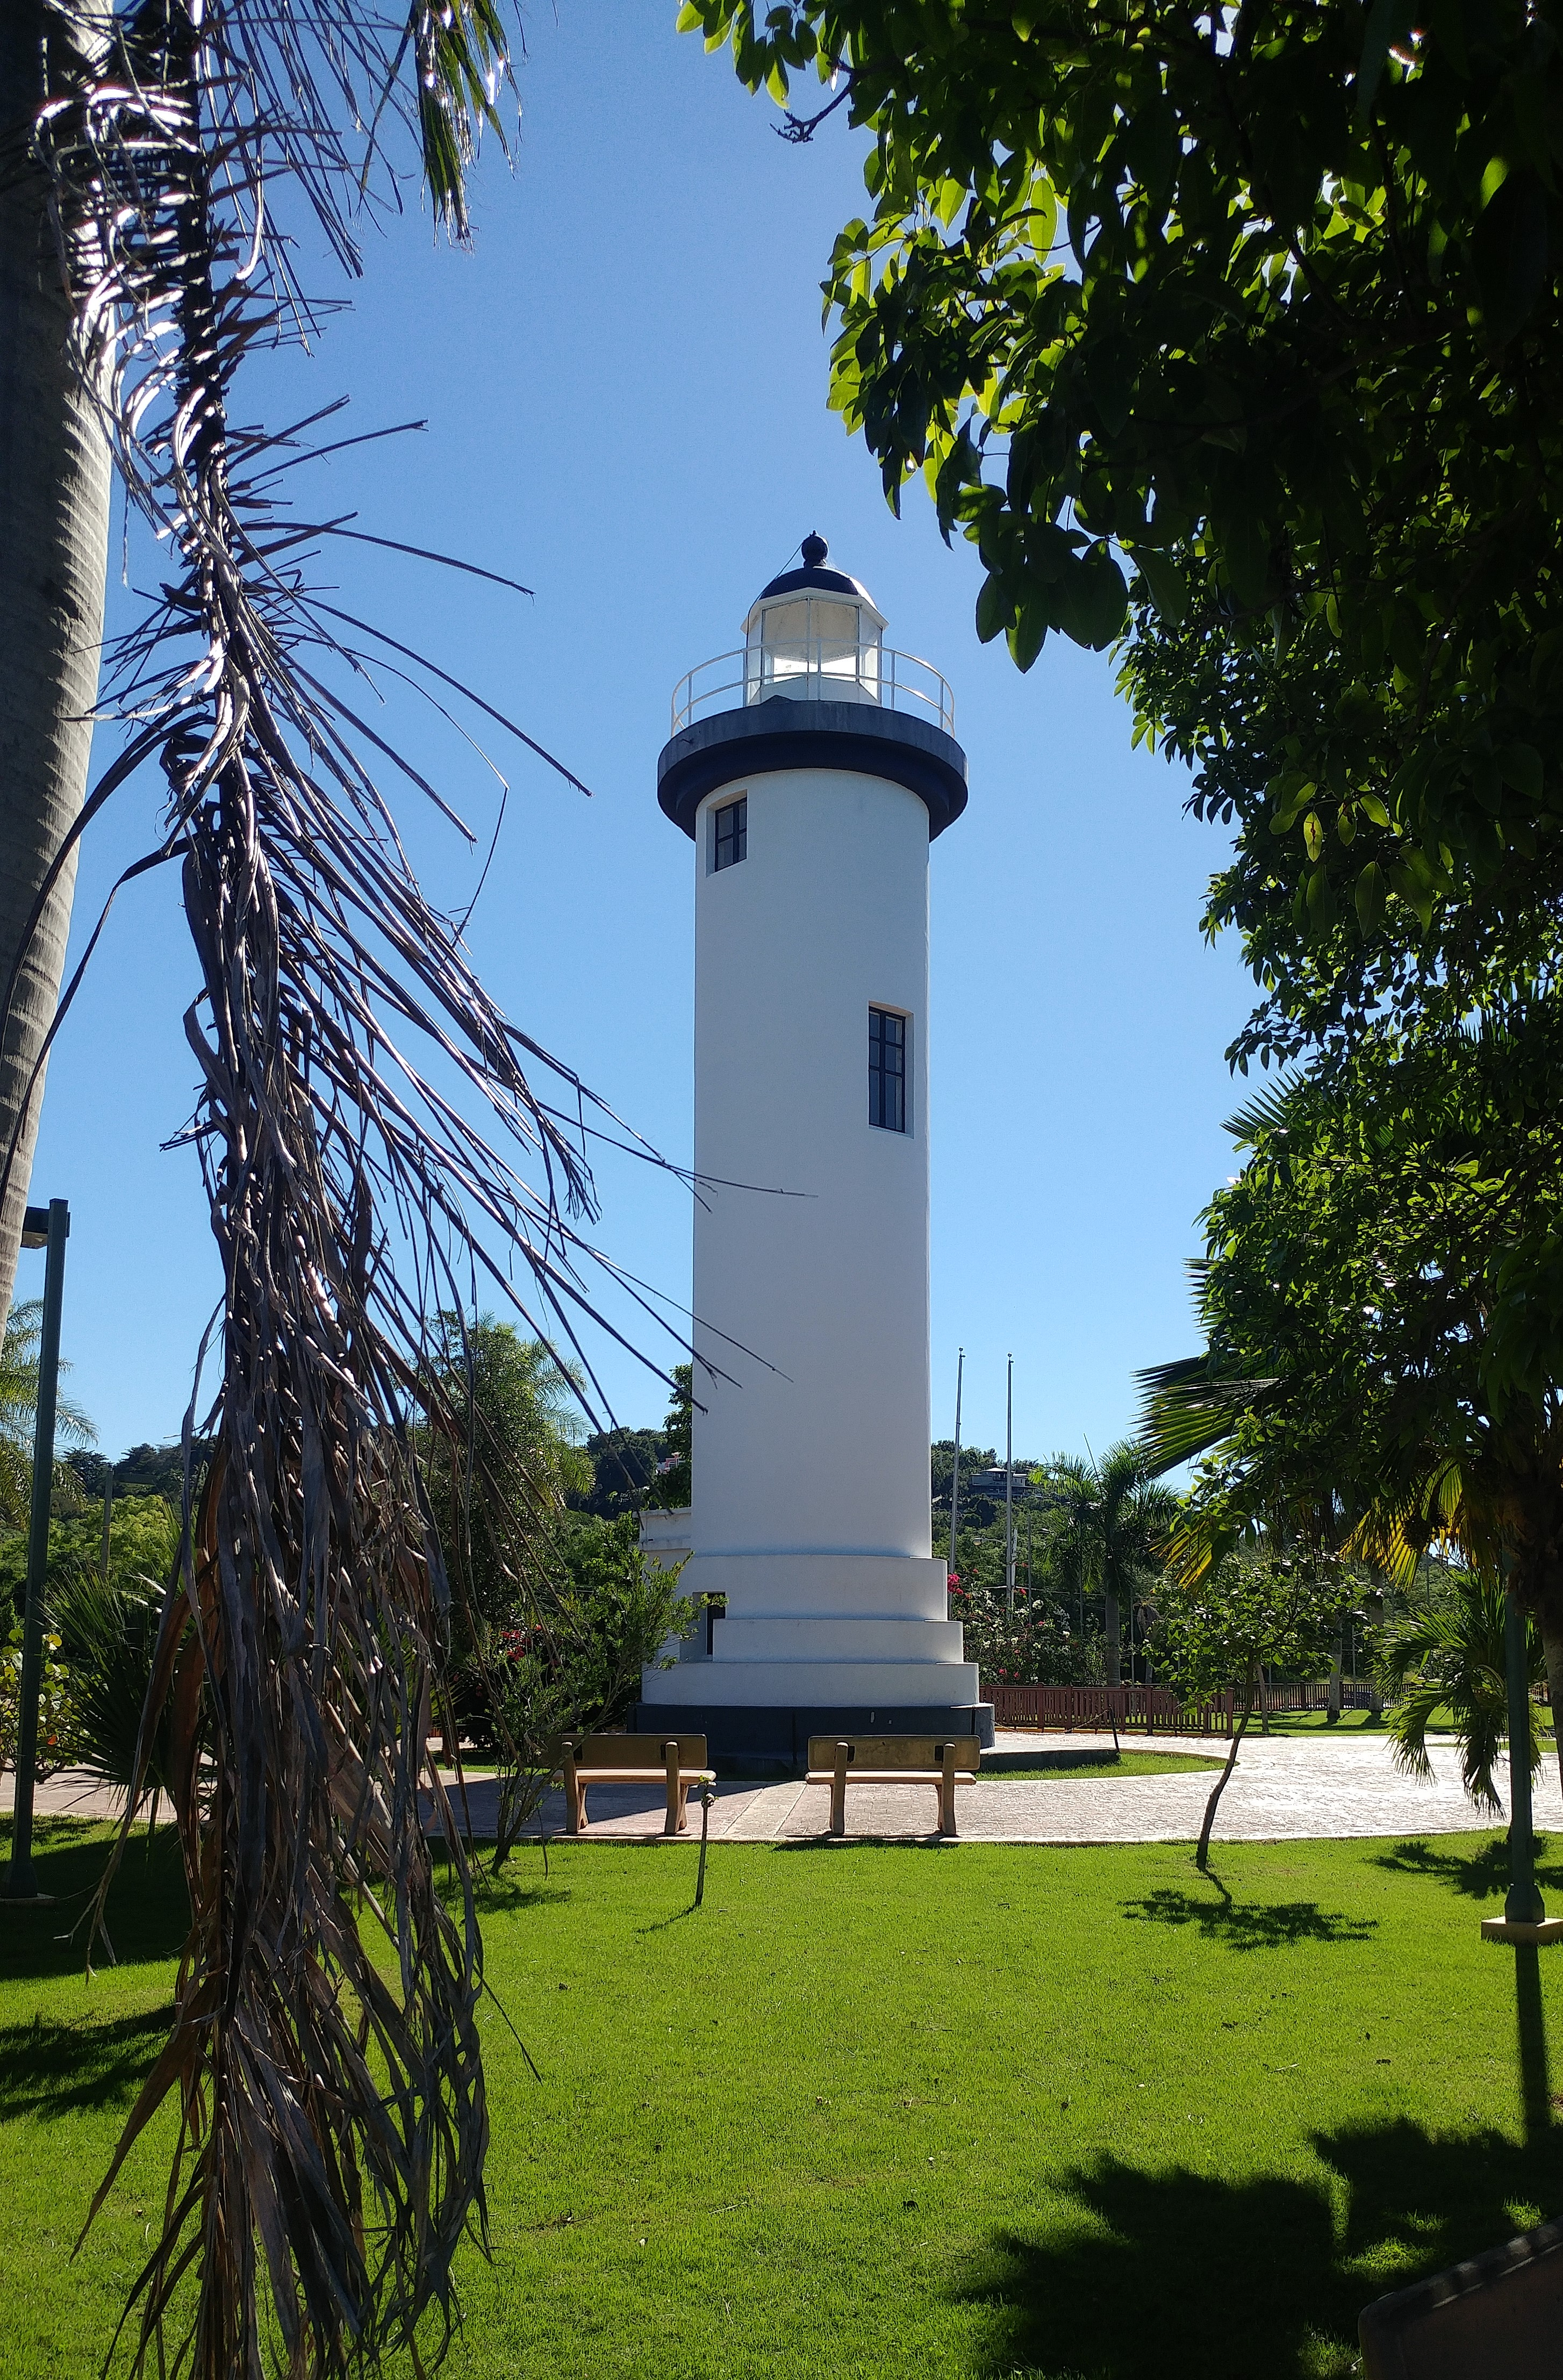 el-faro-lighthouse